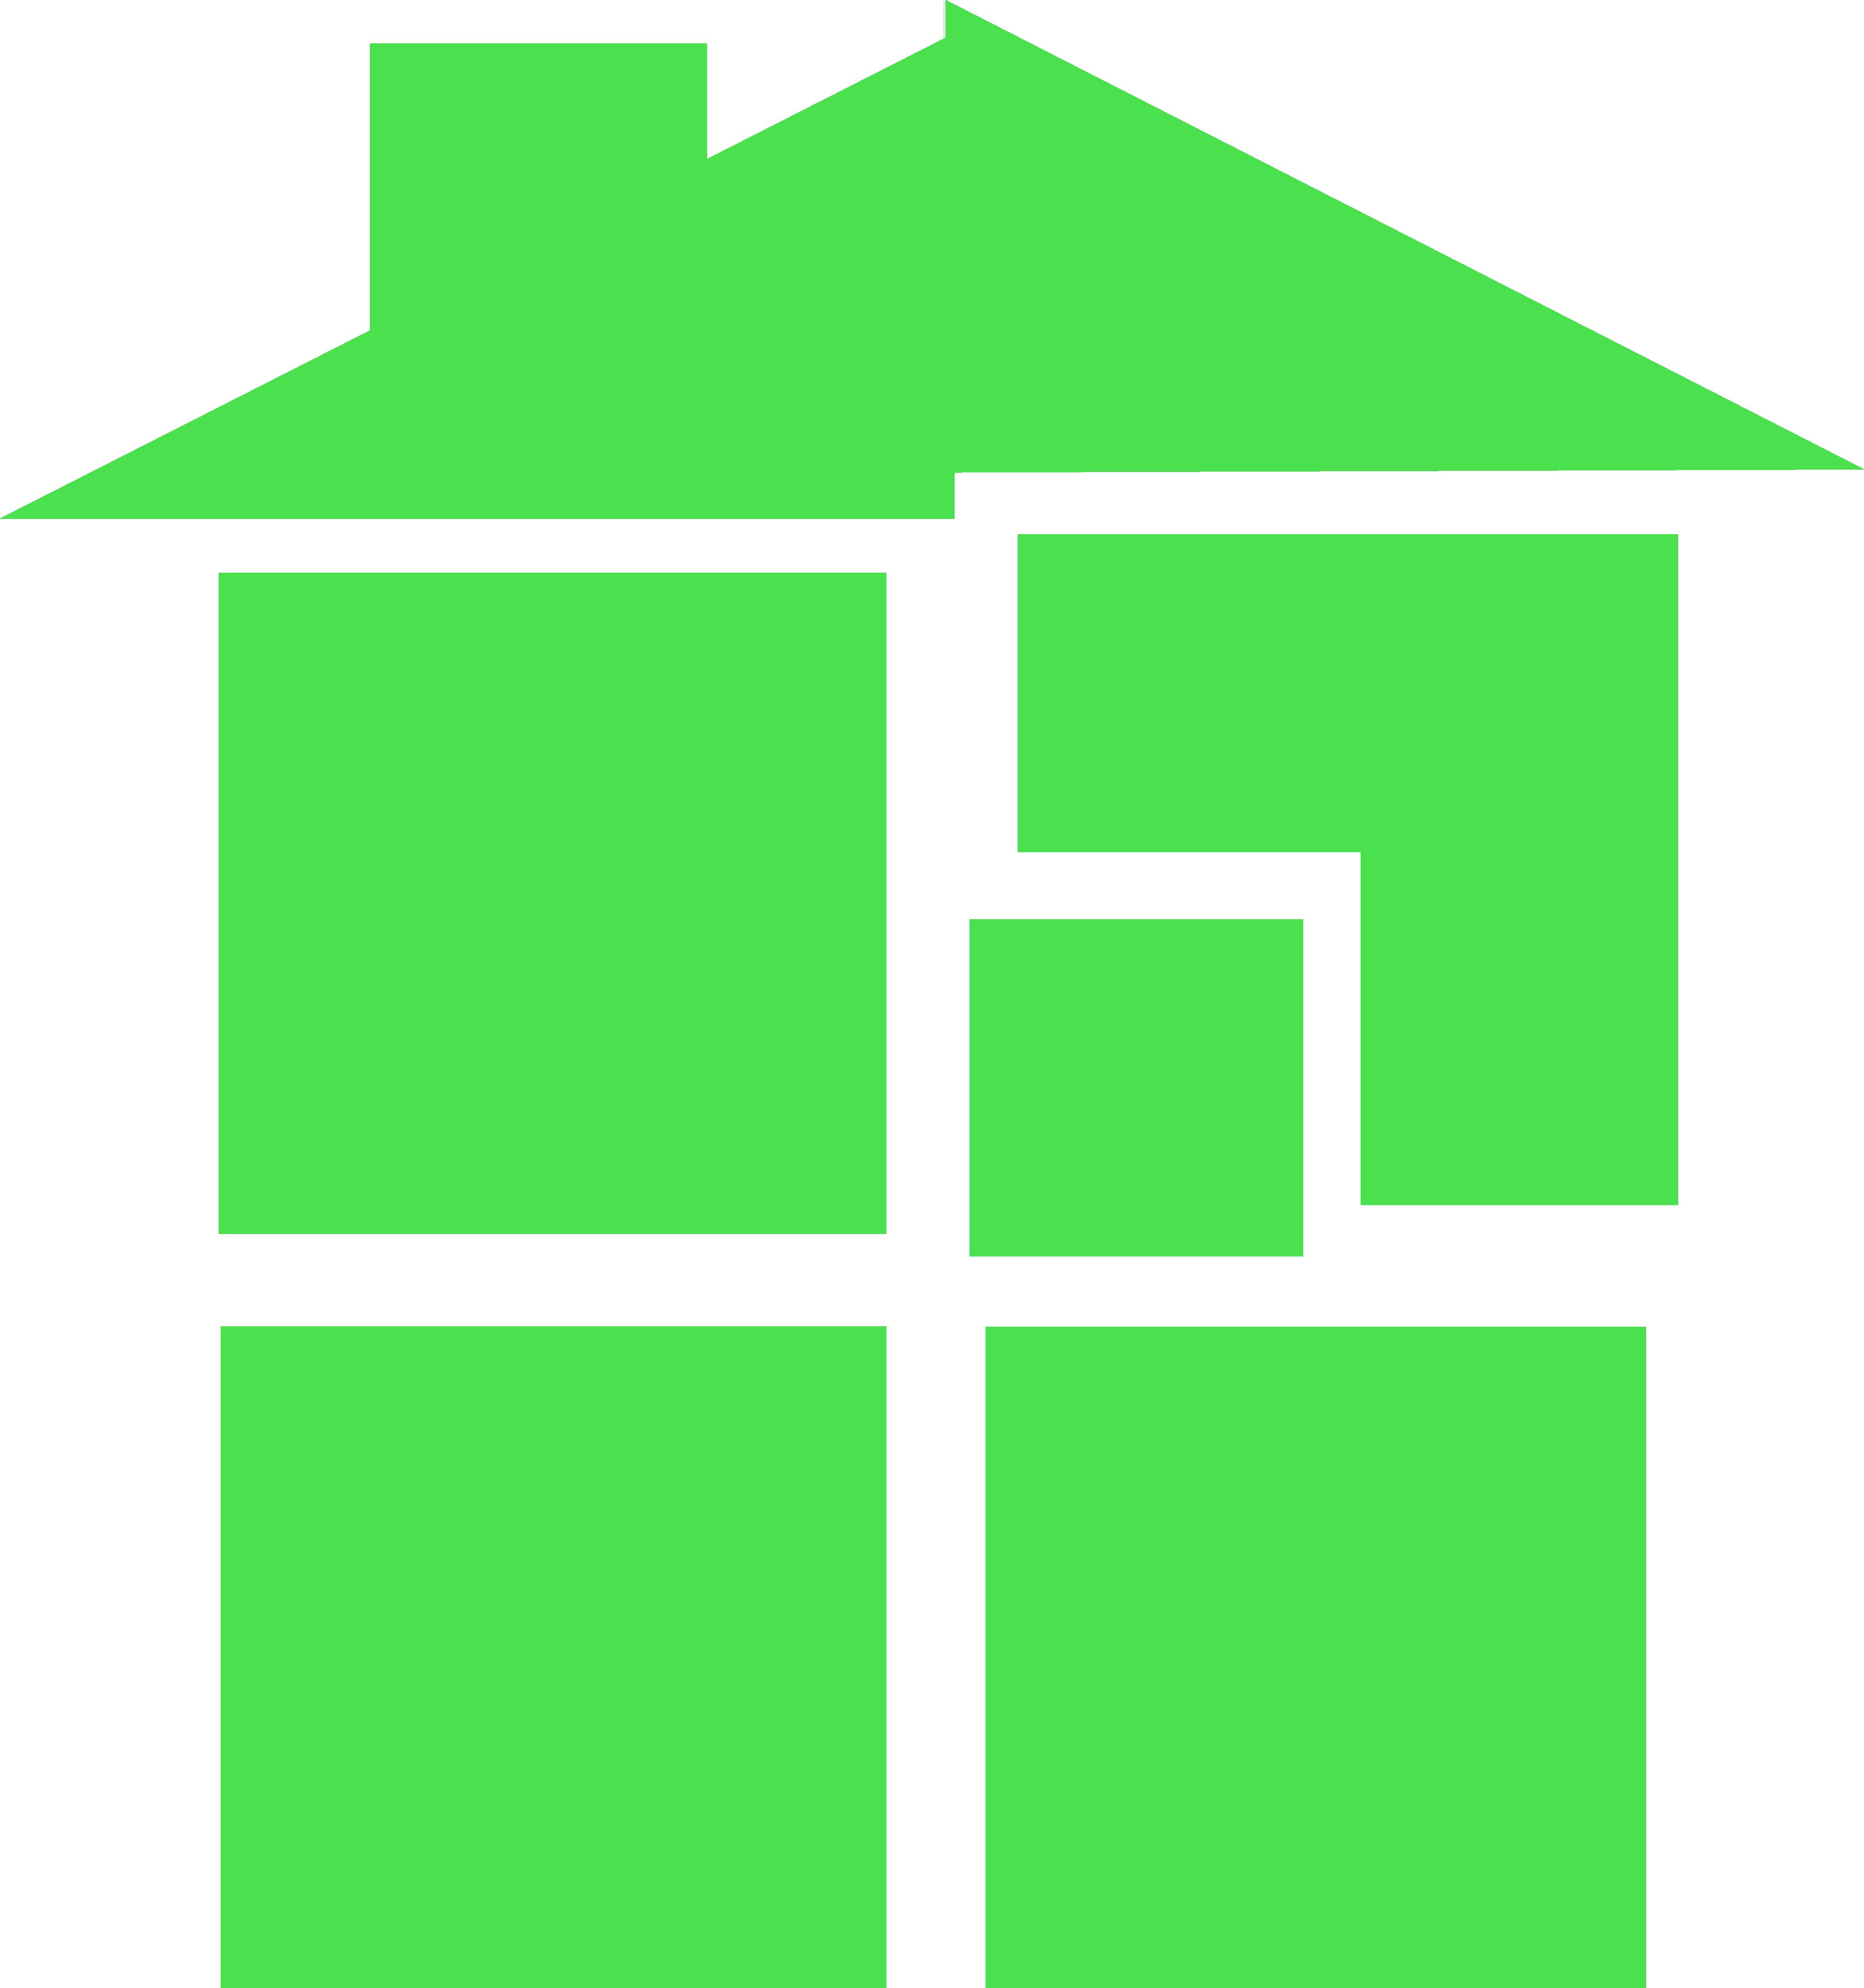 homestuck logo wallpaper - photo #26